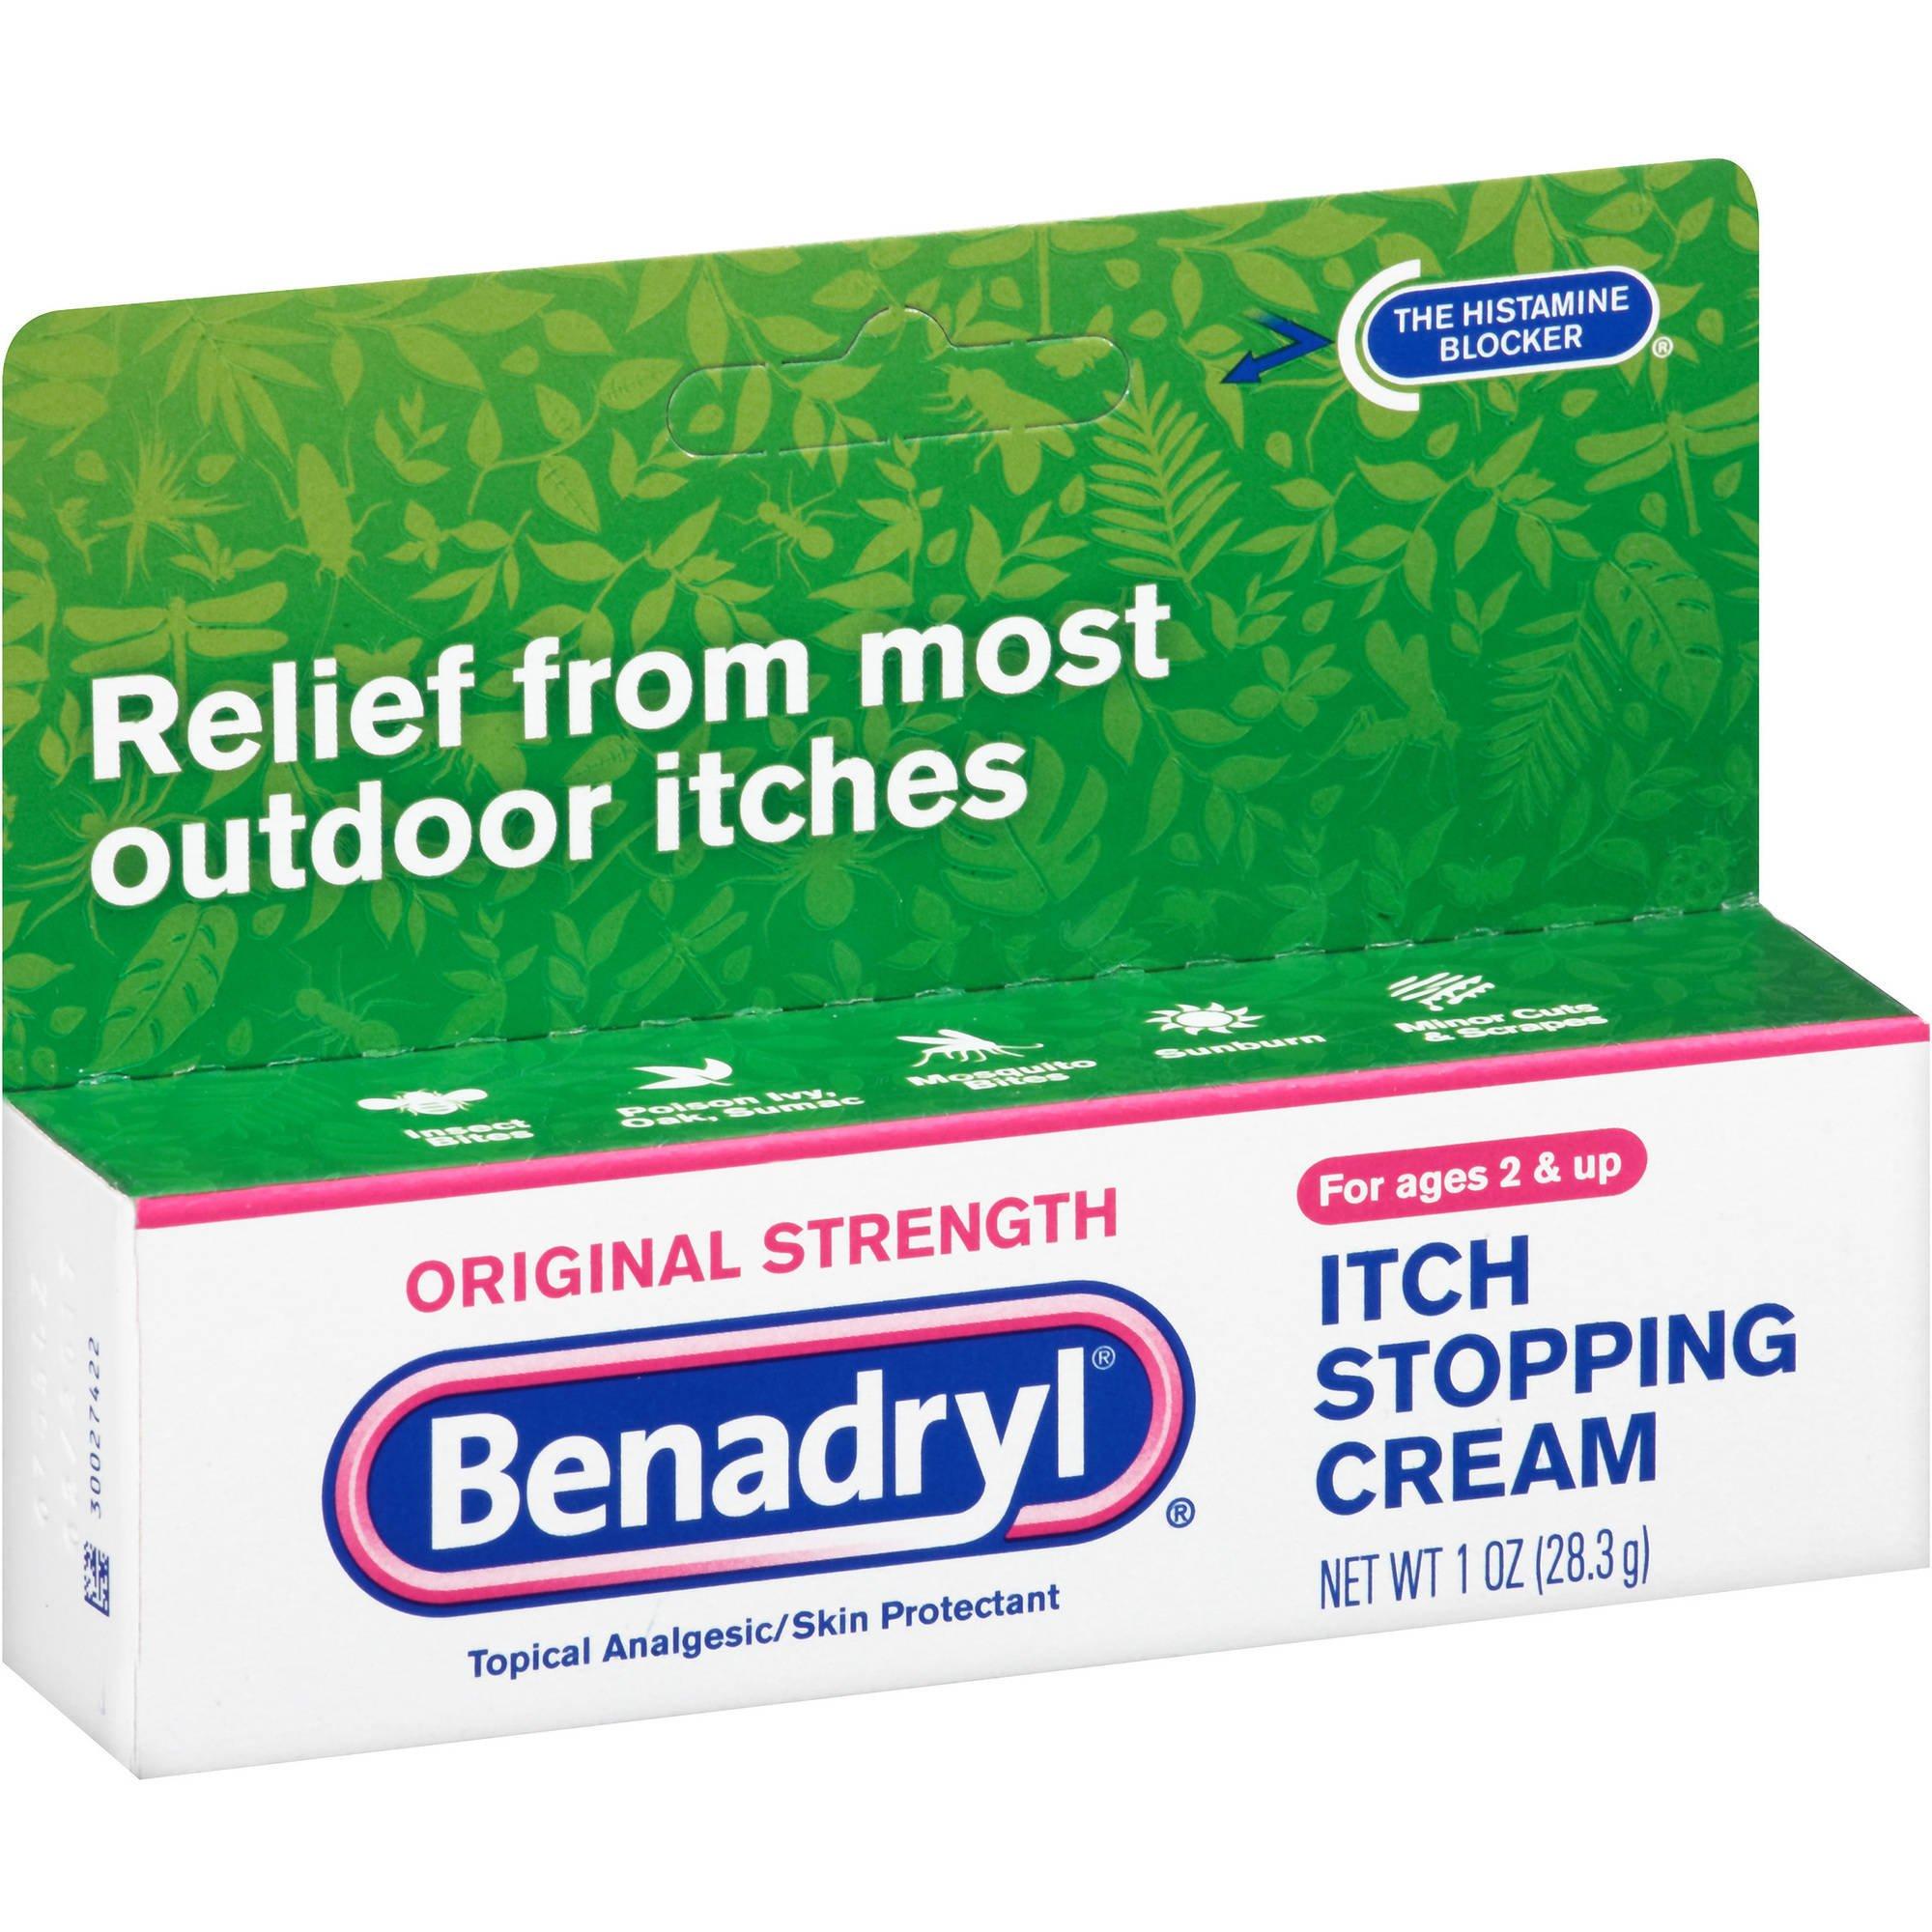 Benadryl Original Itch Stop Cream, 1 OZ (Pack of 6) by Benadryl